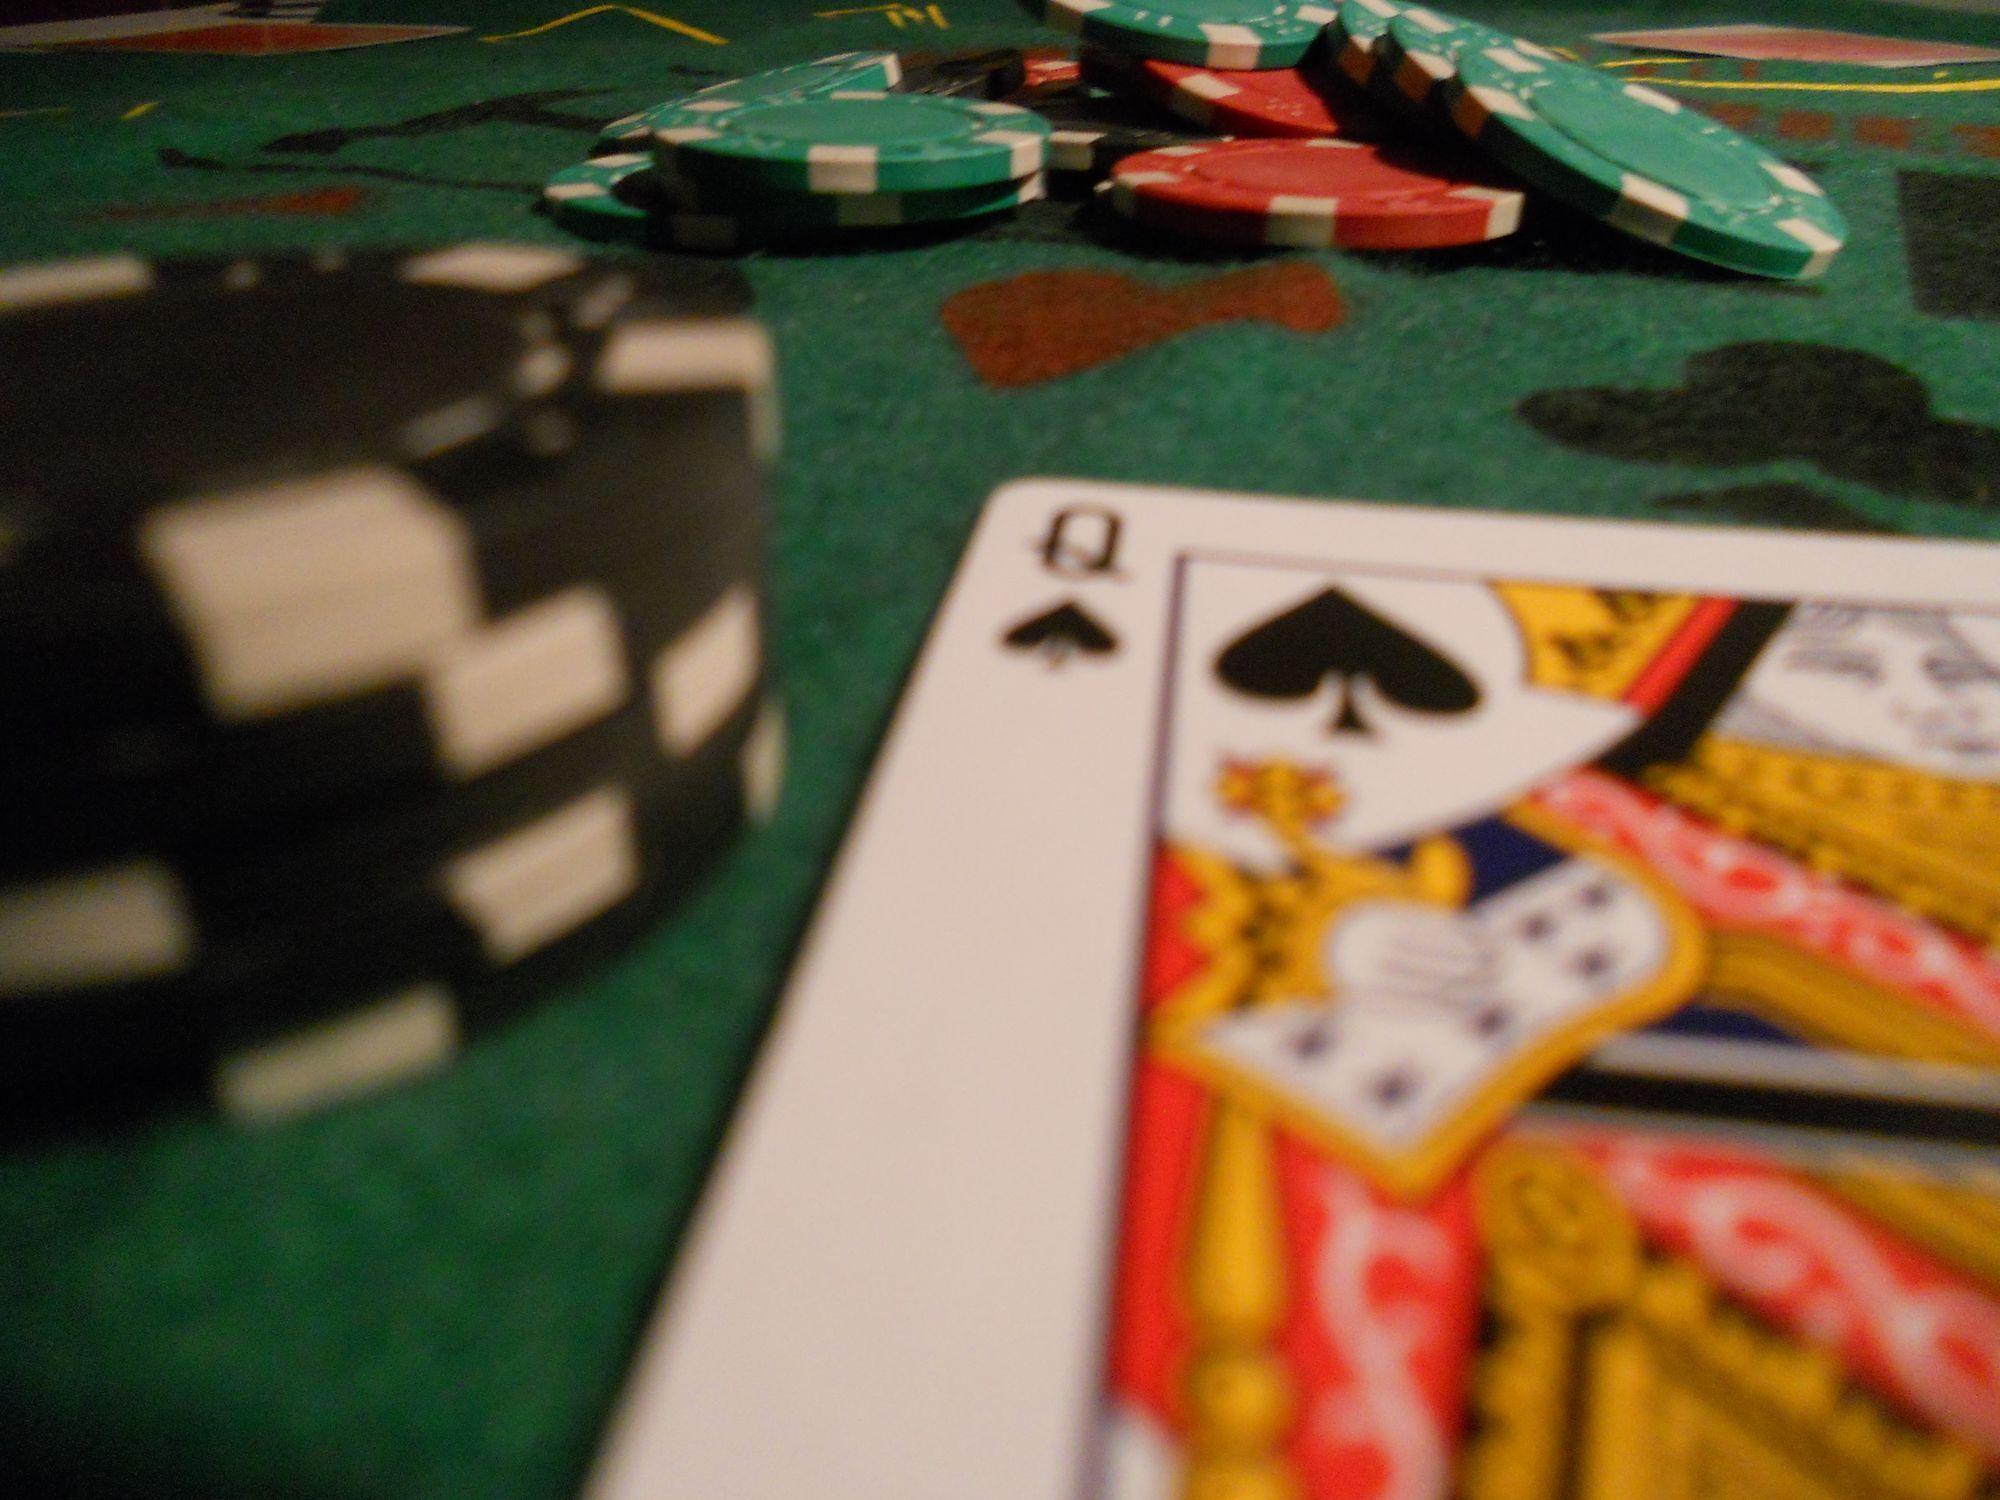 Programas de ayuda para poker online